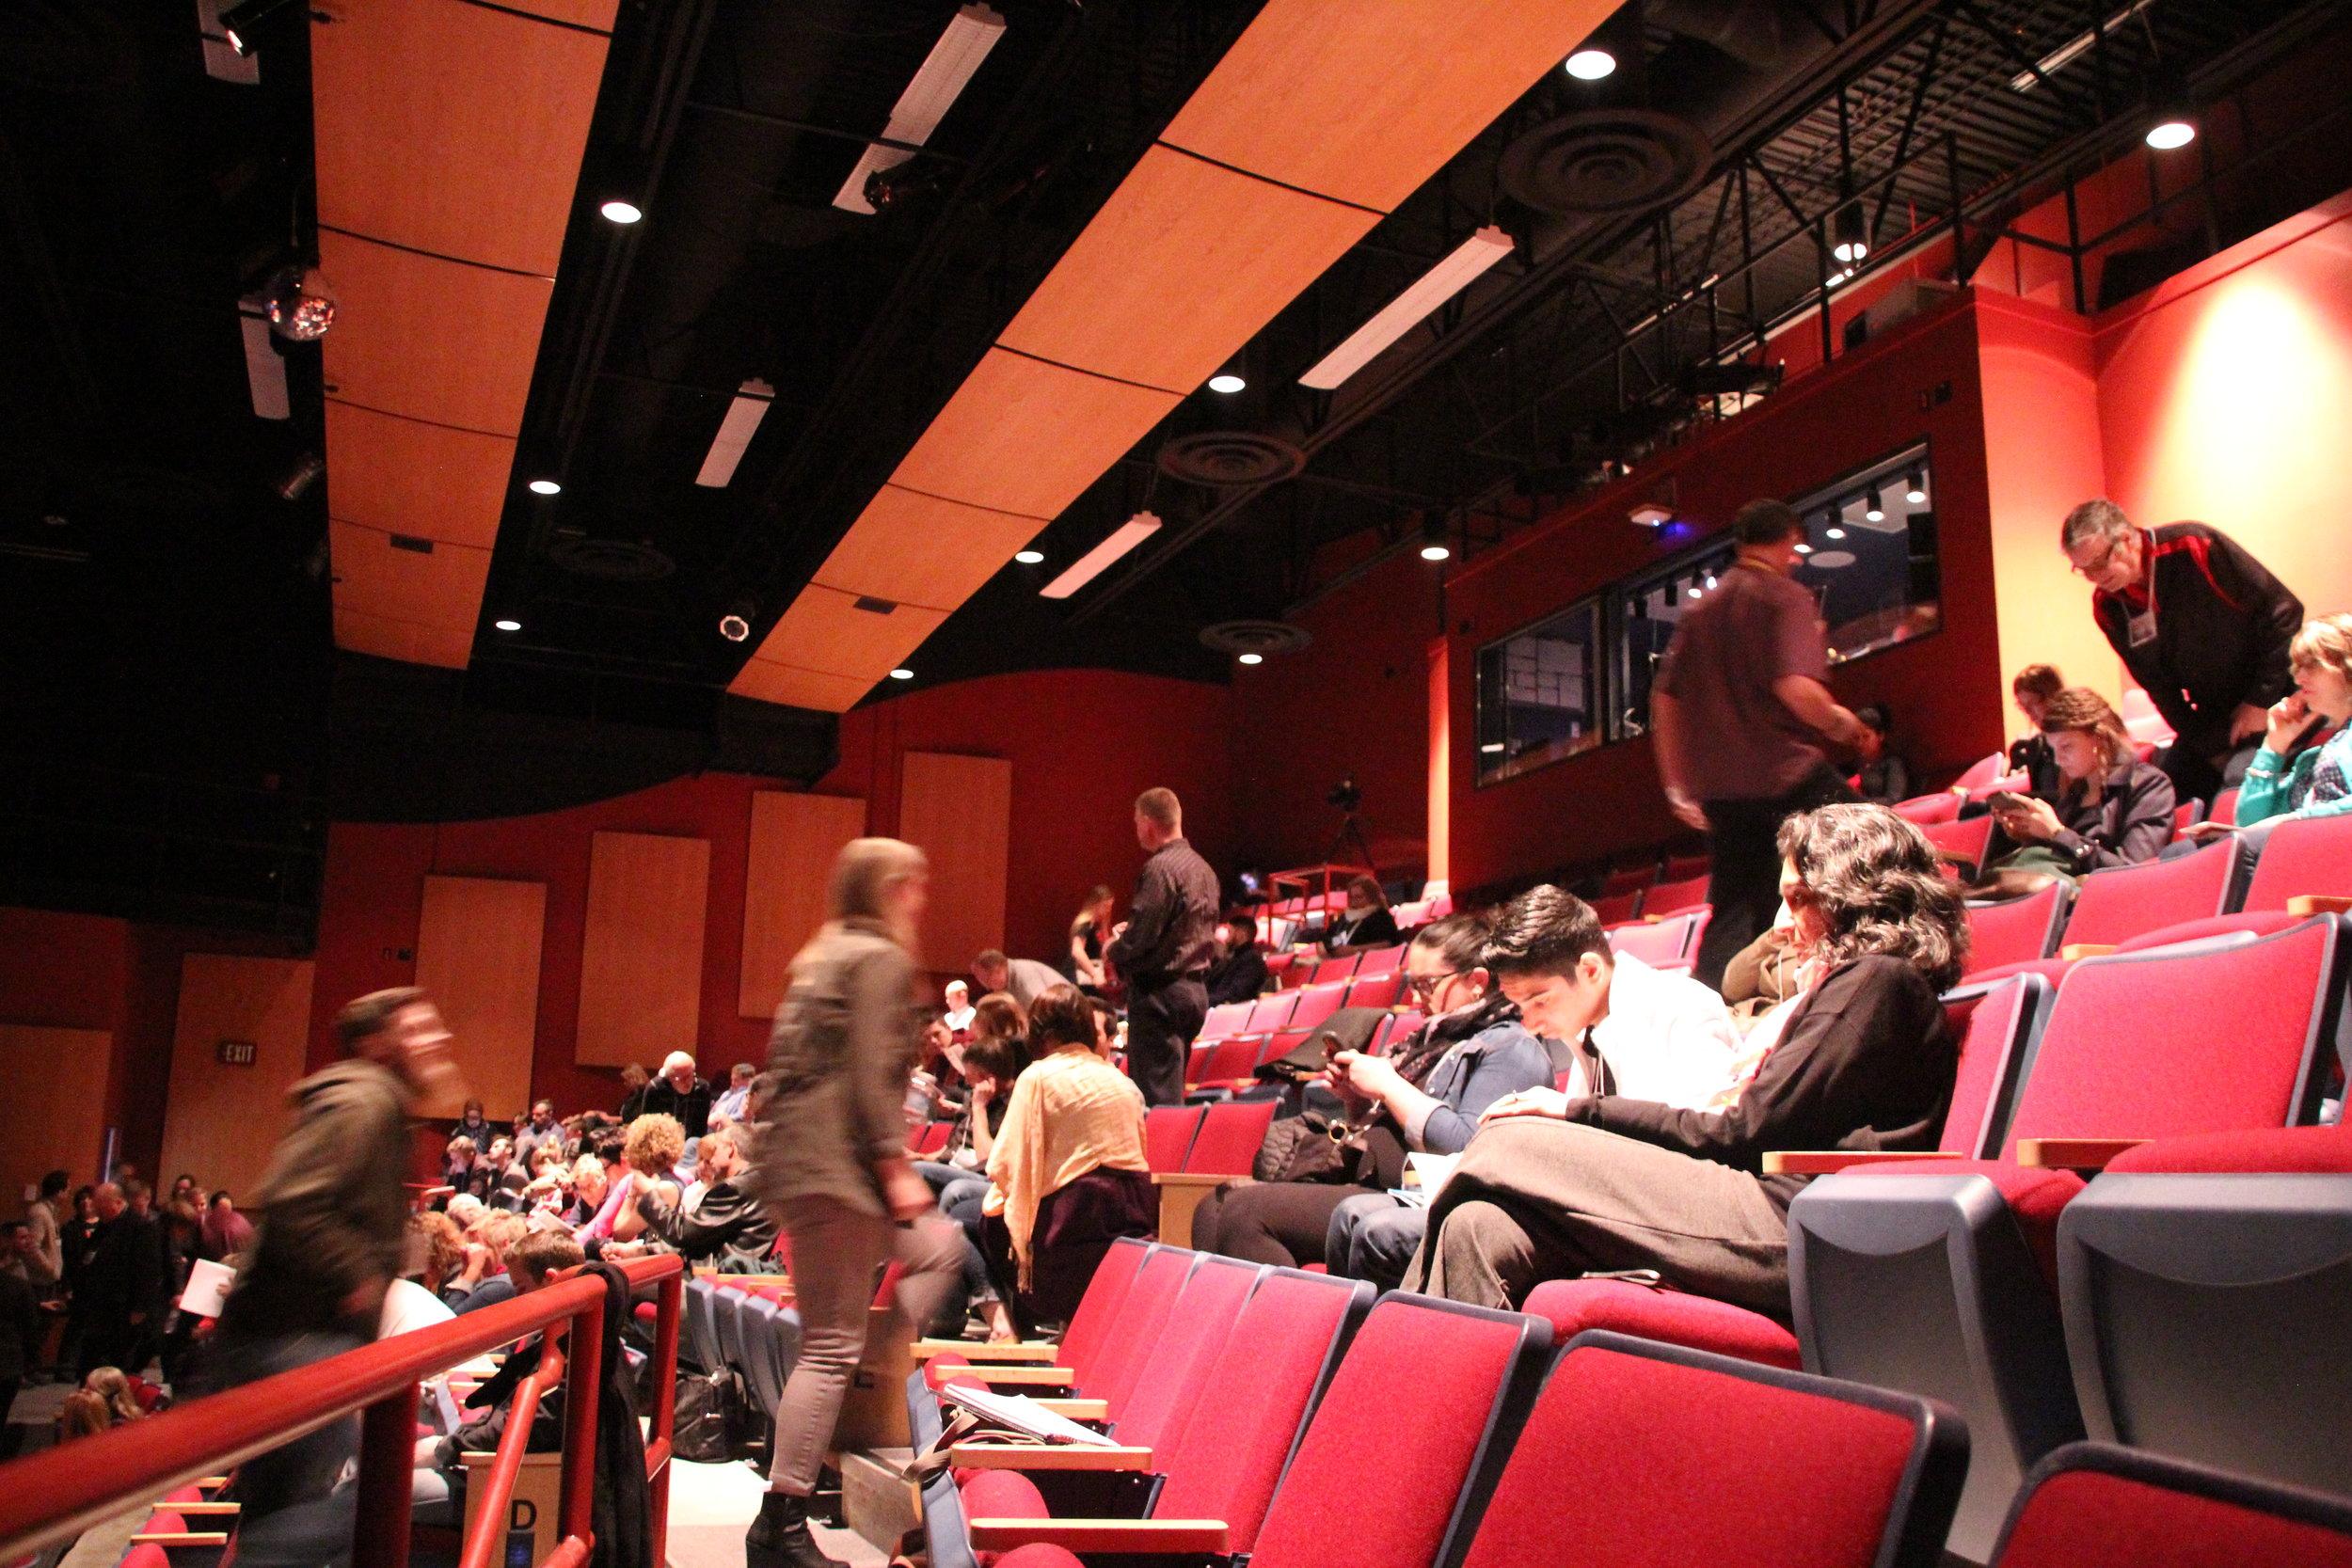 G. W. Graham Theatre